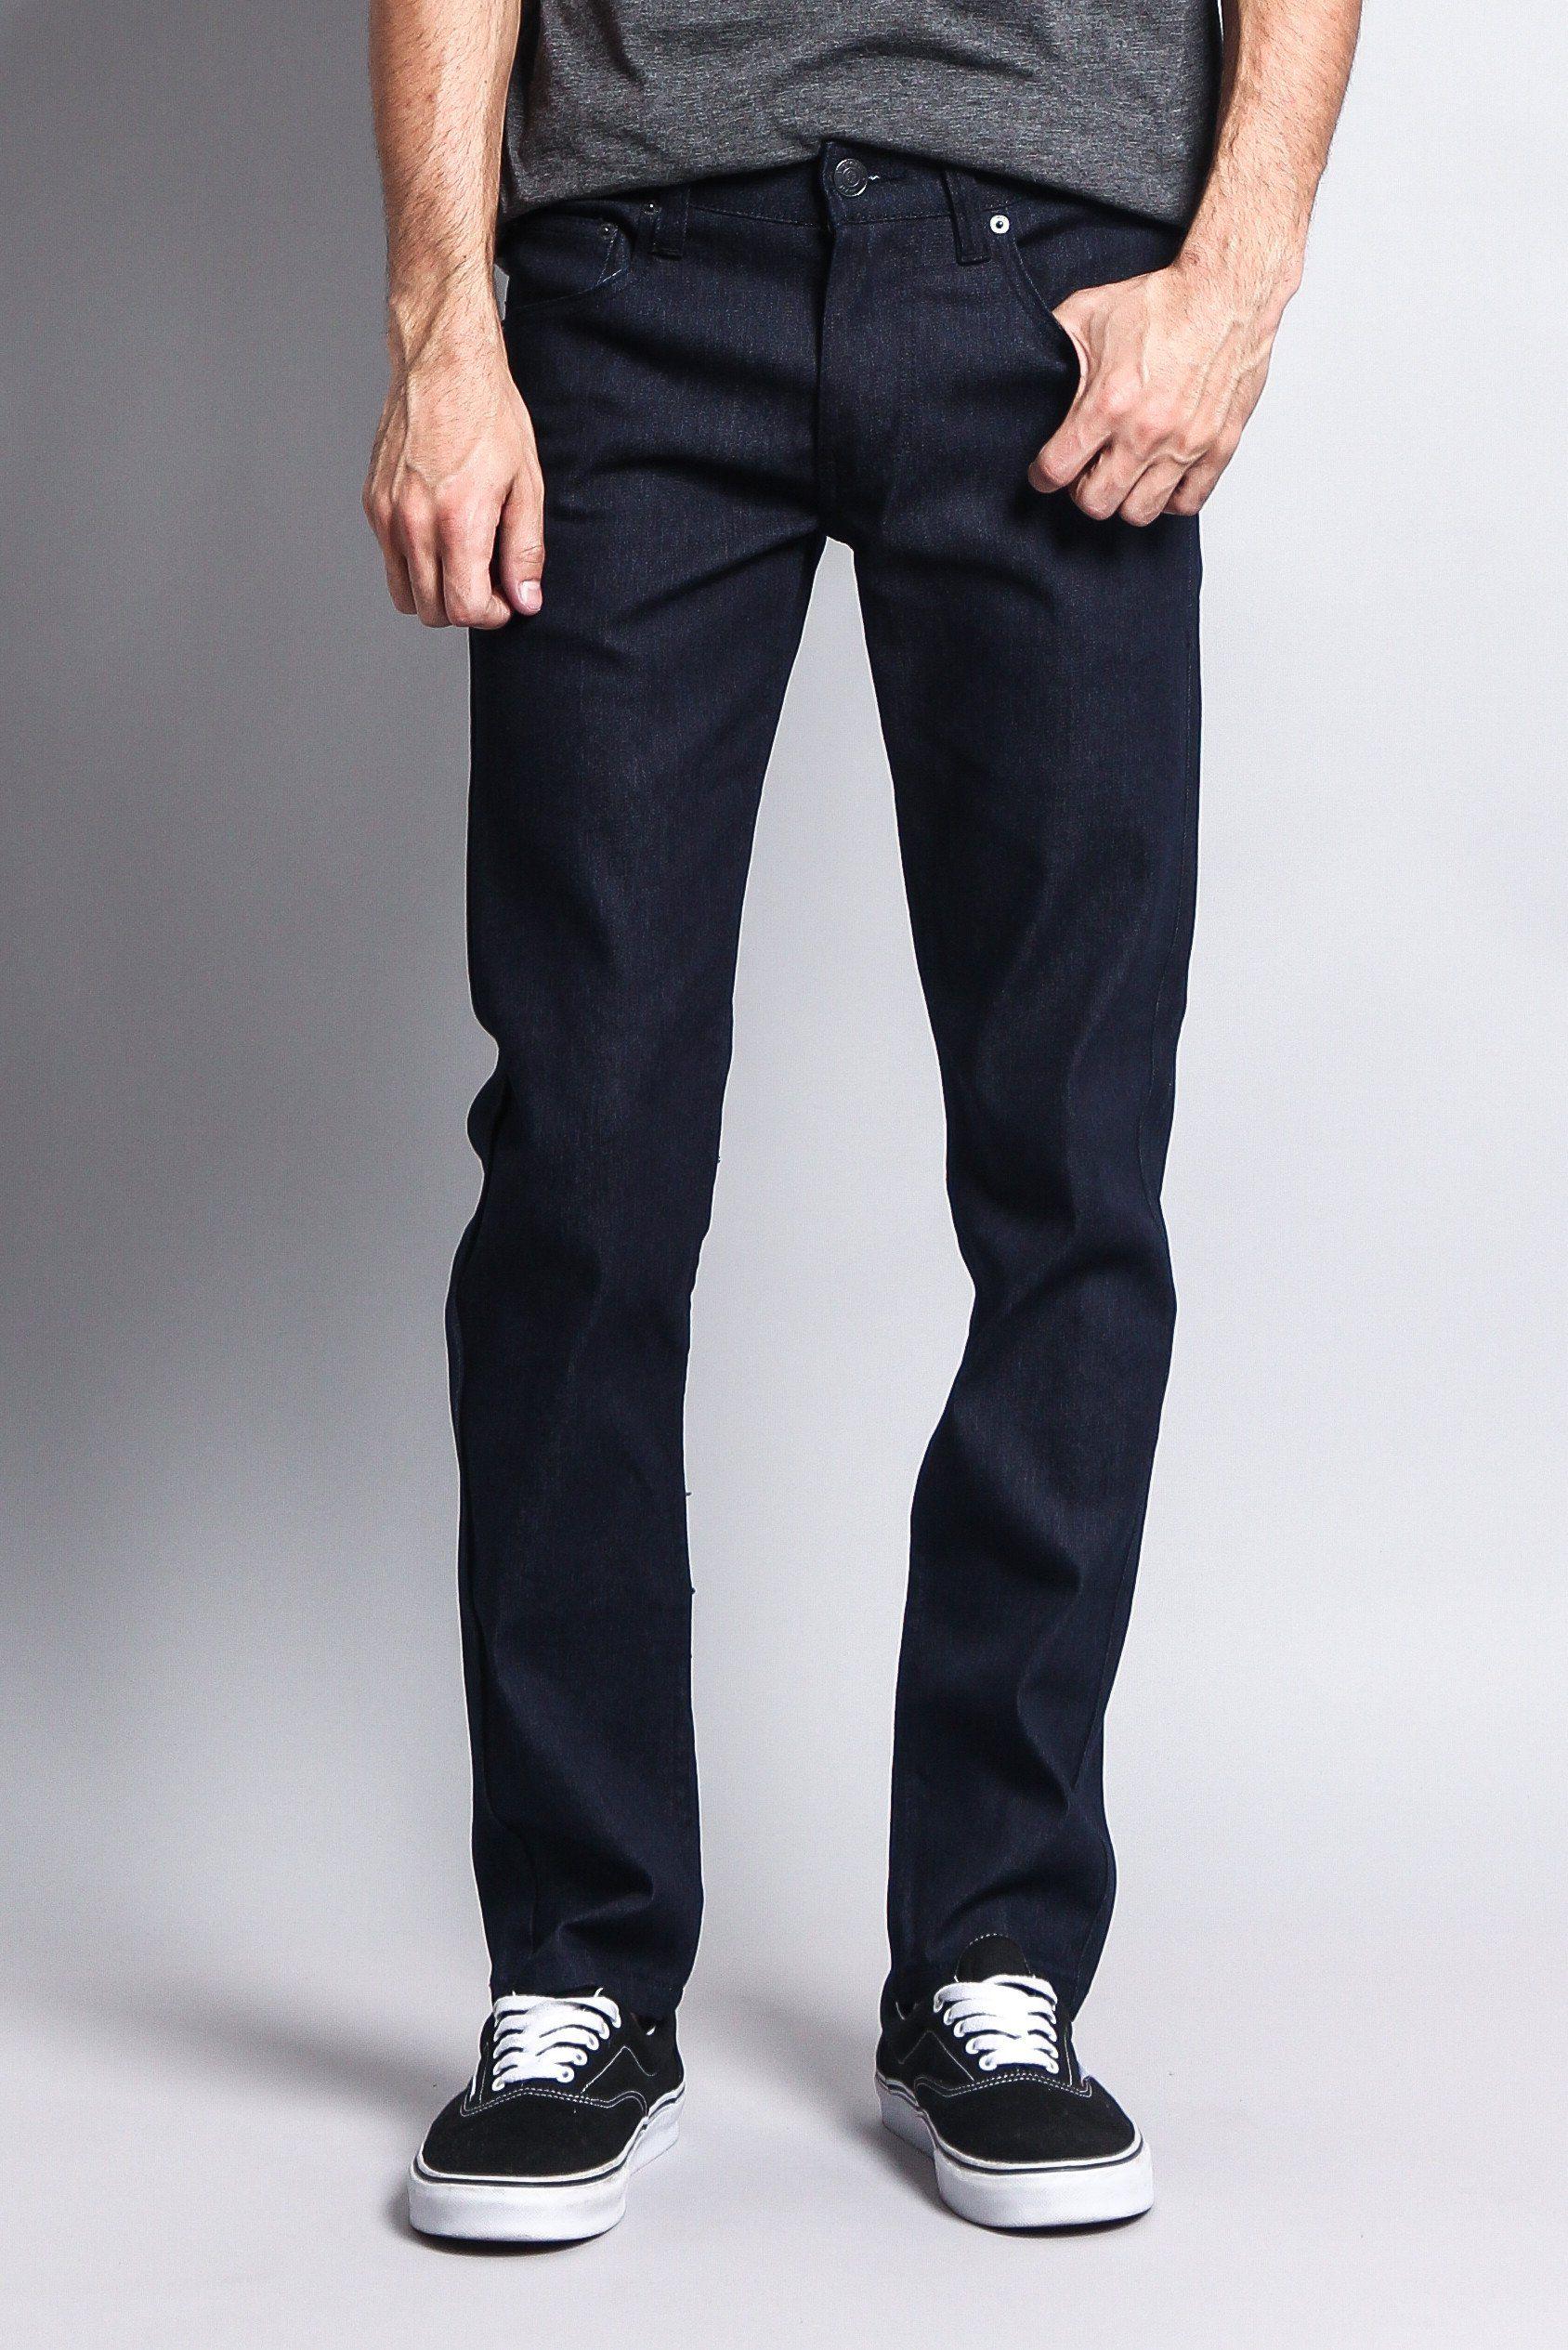 Men's Skinny Fit Raw Denim Jeans DL938 (Indigo)